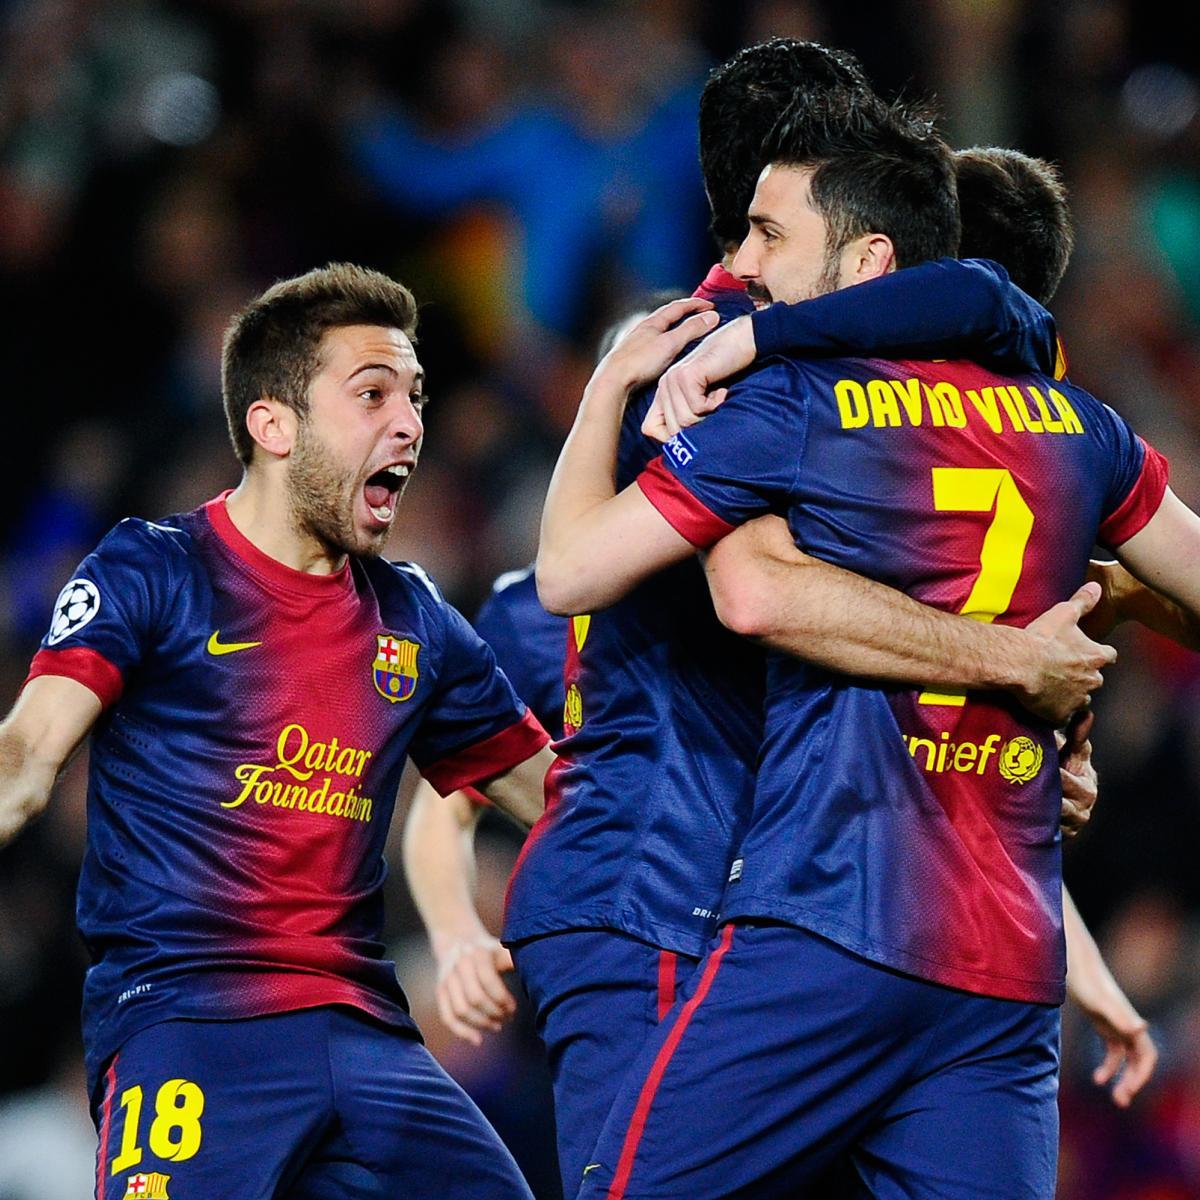 Liverpool V Barcelona Live Matchday Blog: Barcelona Vs. AC Milan: Live Score, Highlights And